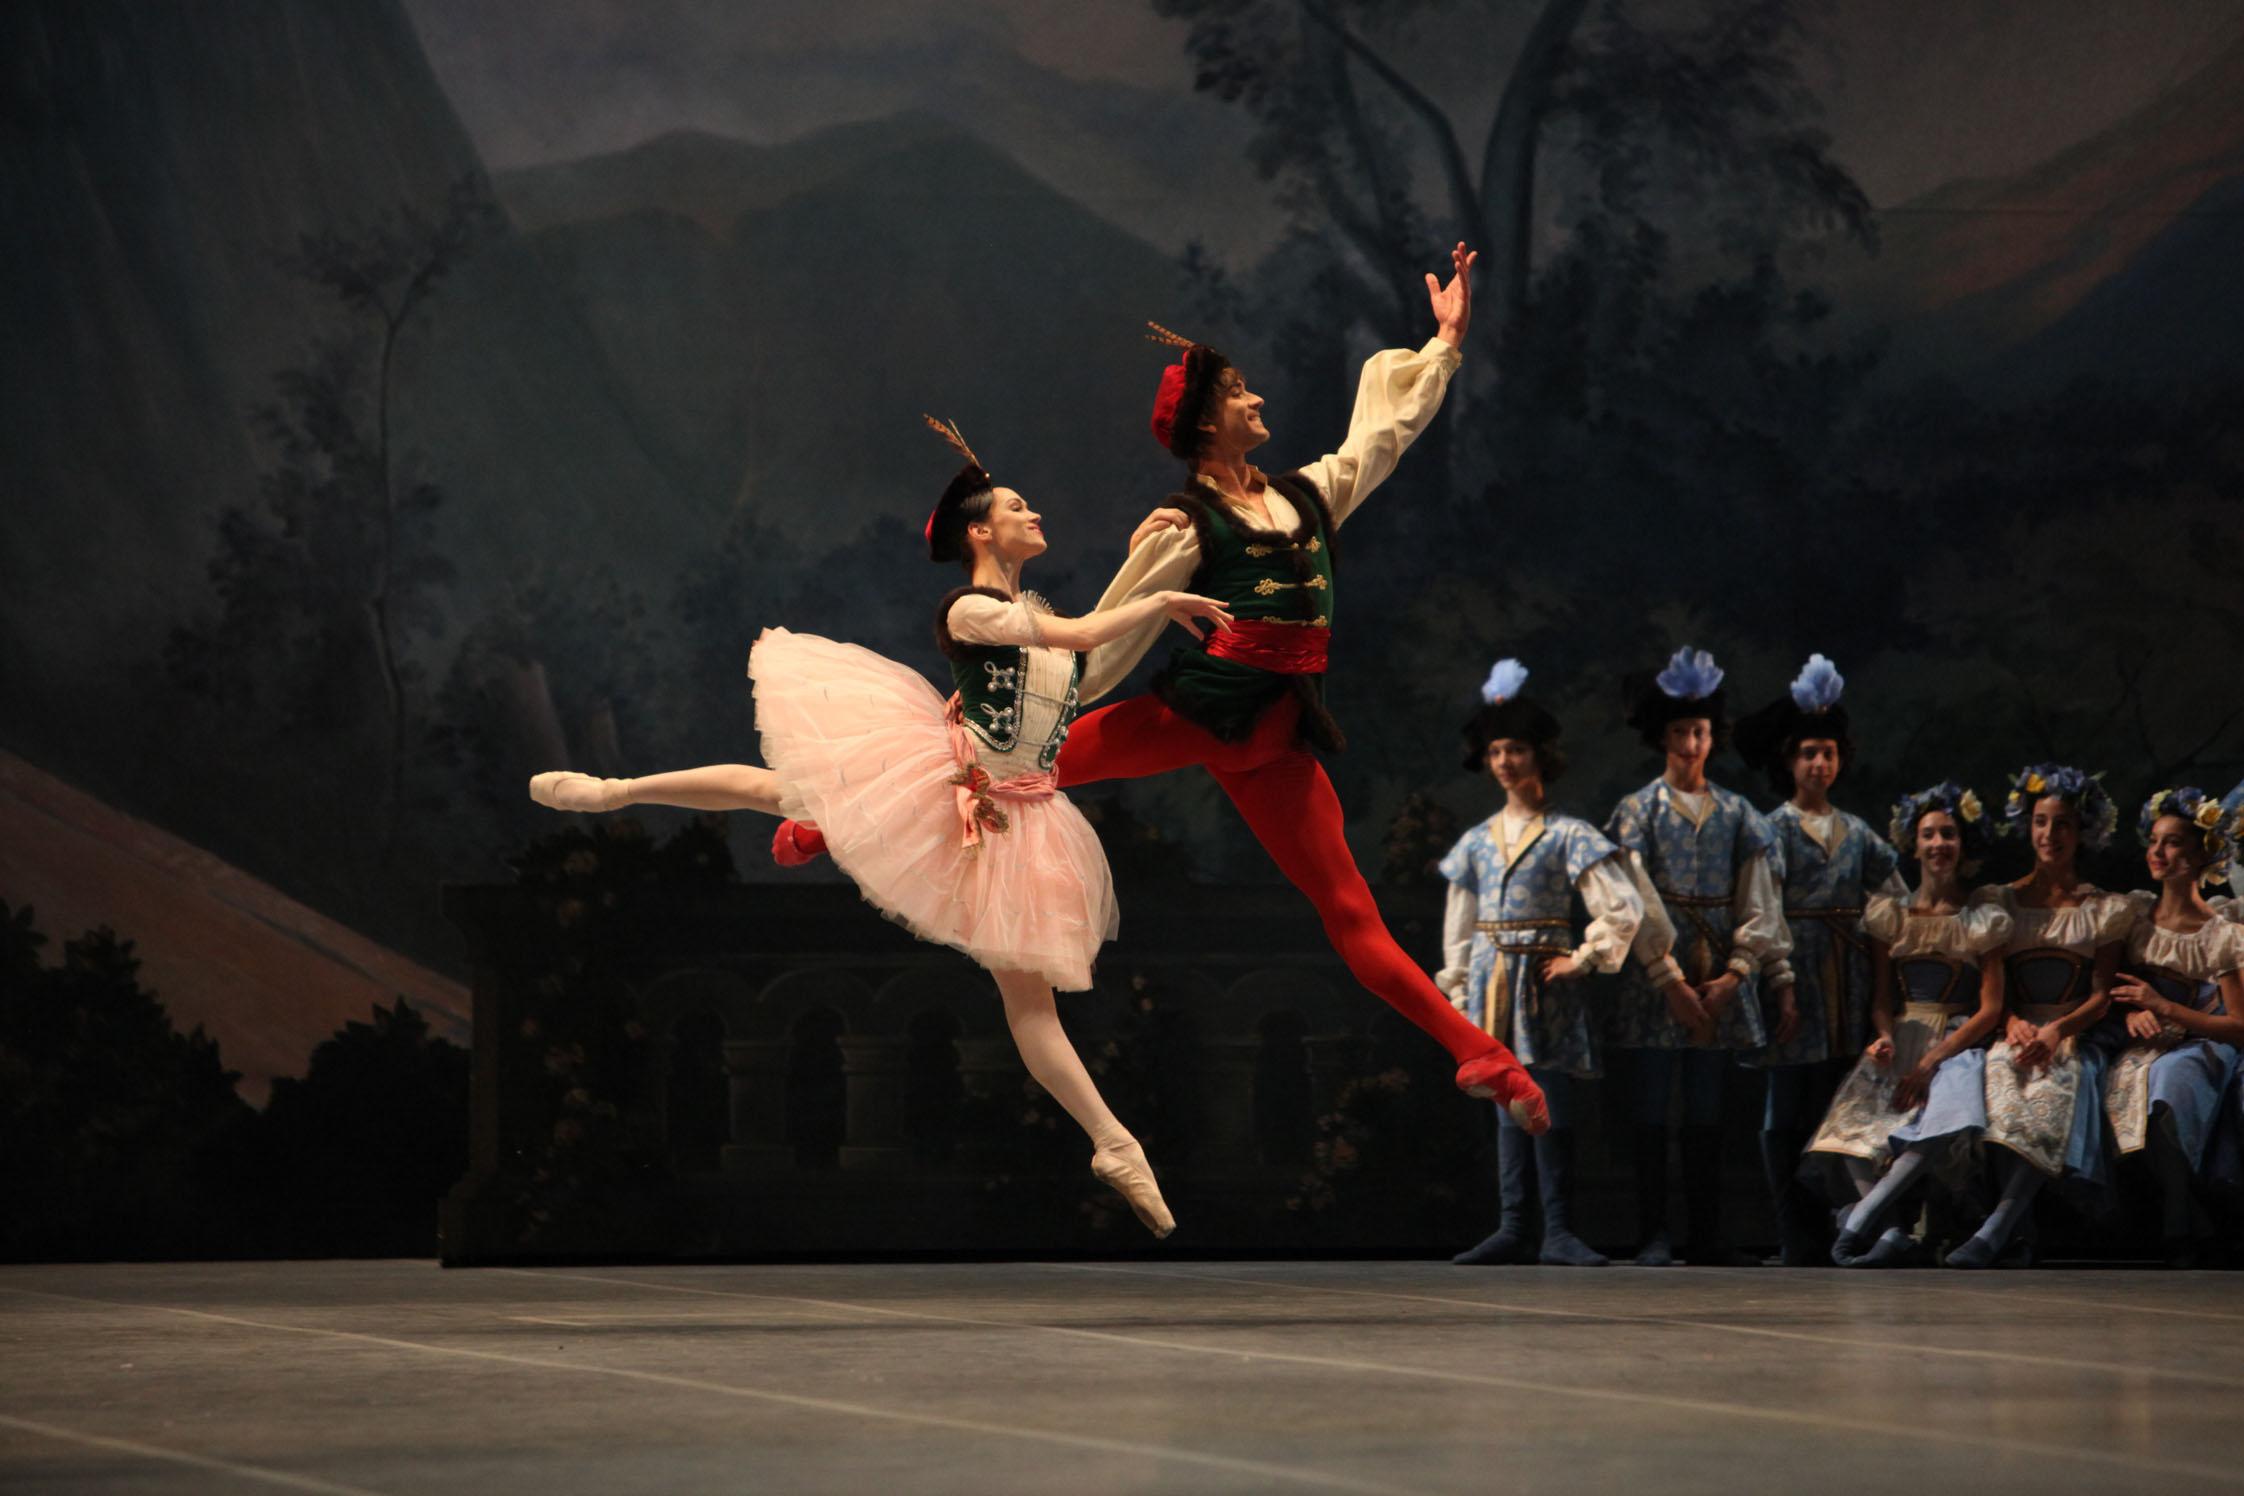 Olesia Novikova andFriedemann Vogel    Image© Teatro alla Scala